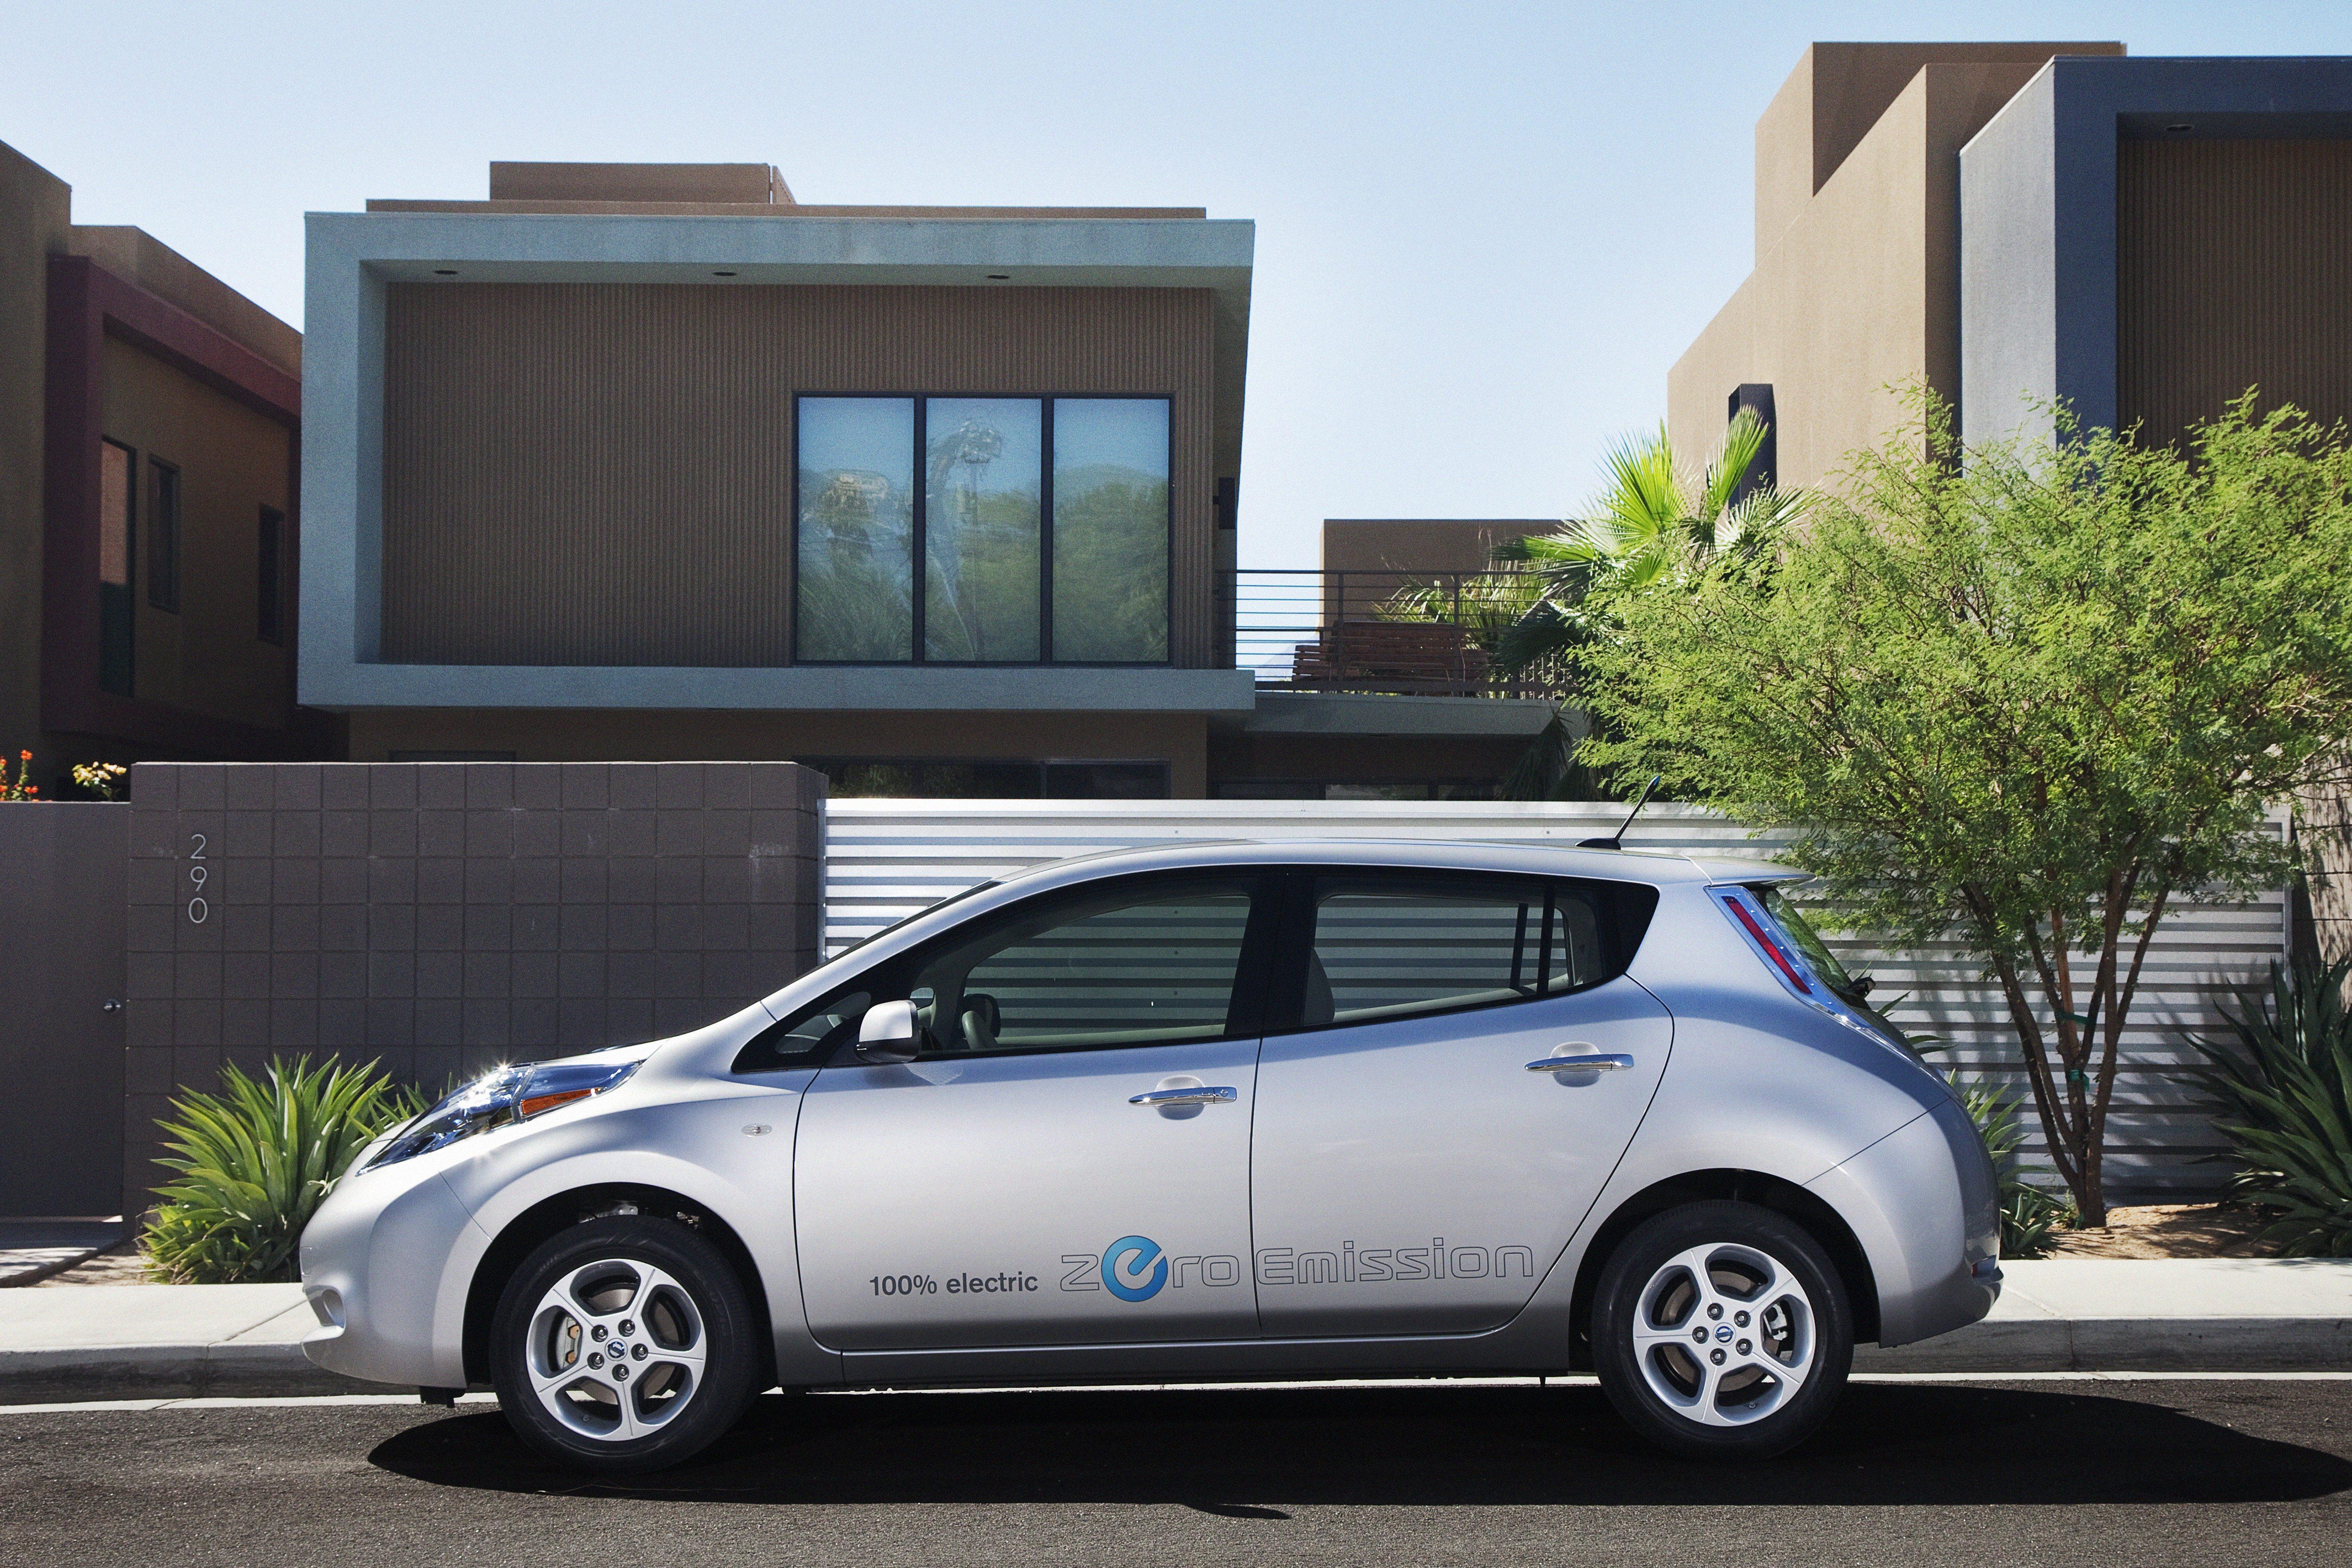 Nissan Expands Leaf Availability into New U.S. Markets